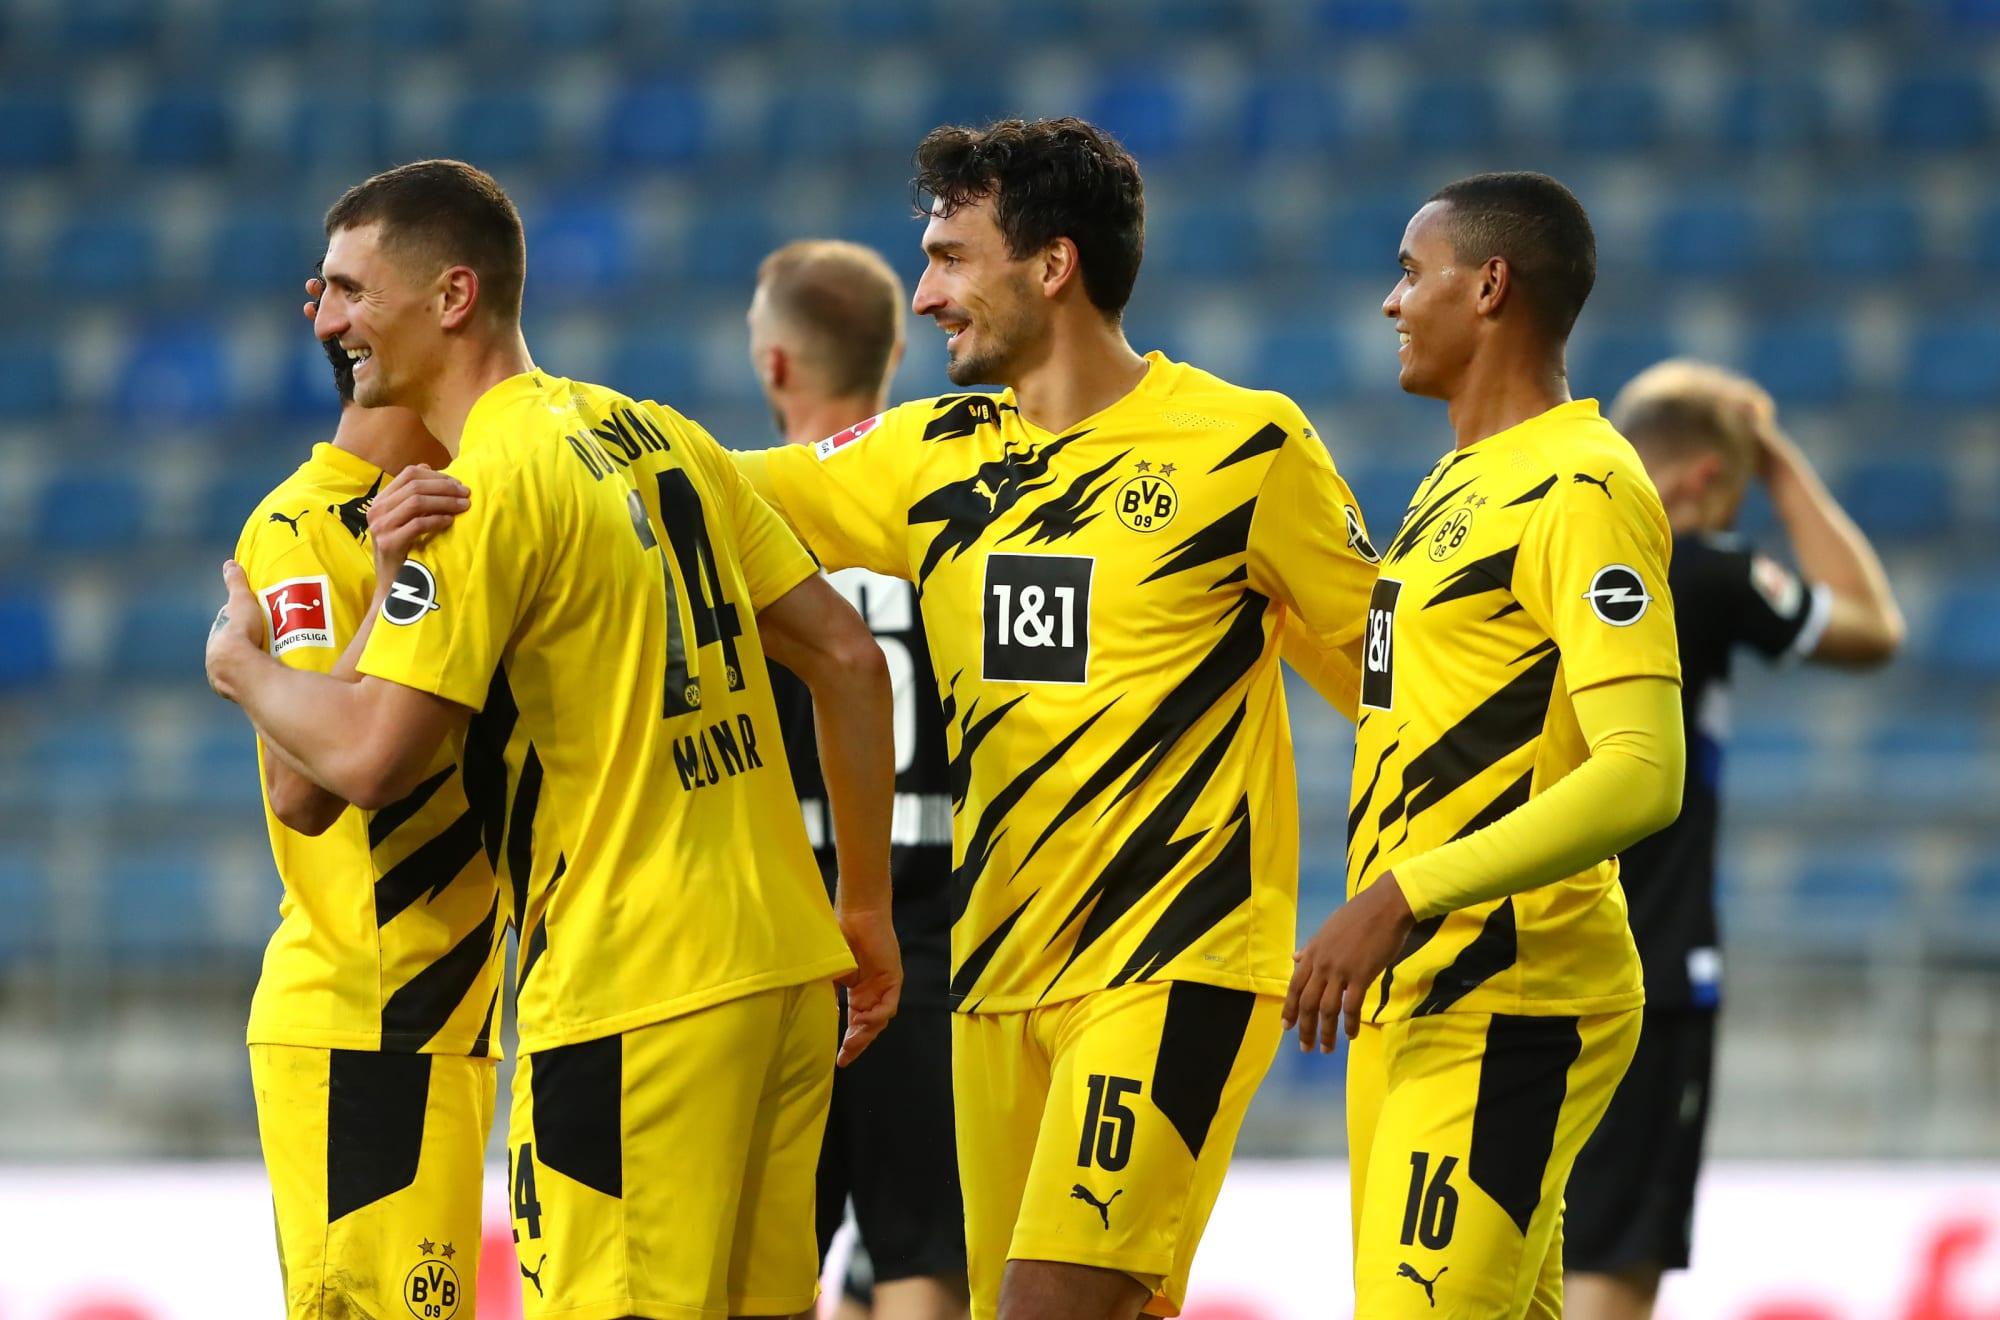 Borussia Dortmund Beat Arminia Bielefeld